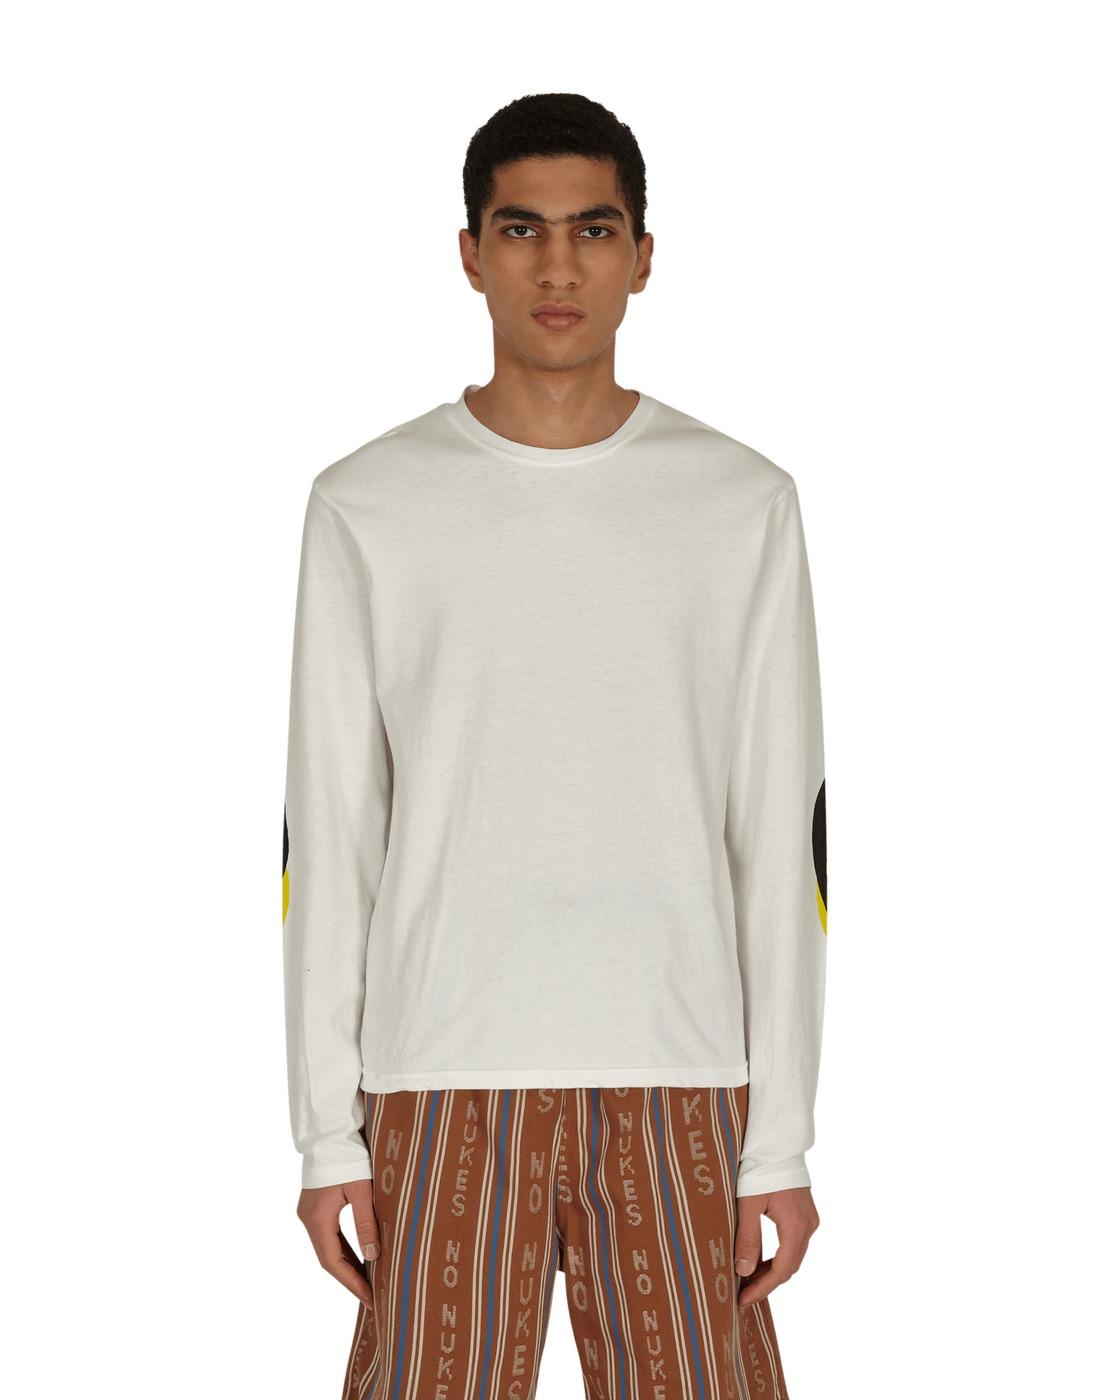 Photo: Kapital Jersey Capital Patch Longsleeve T Shirt White